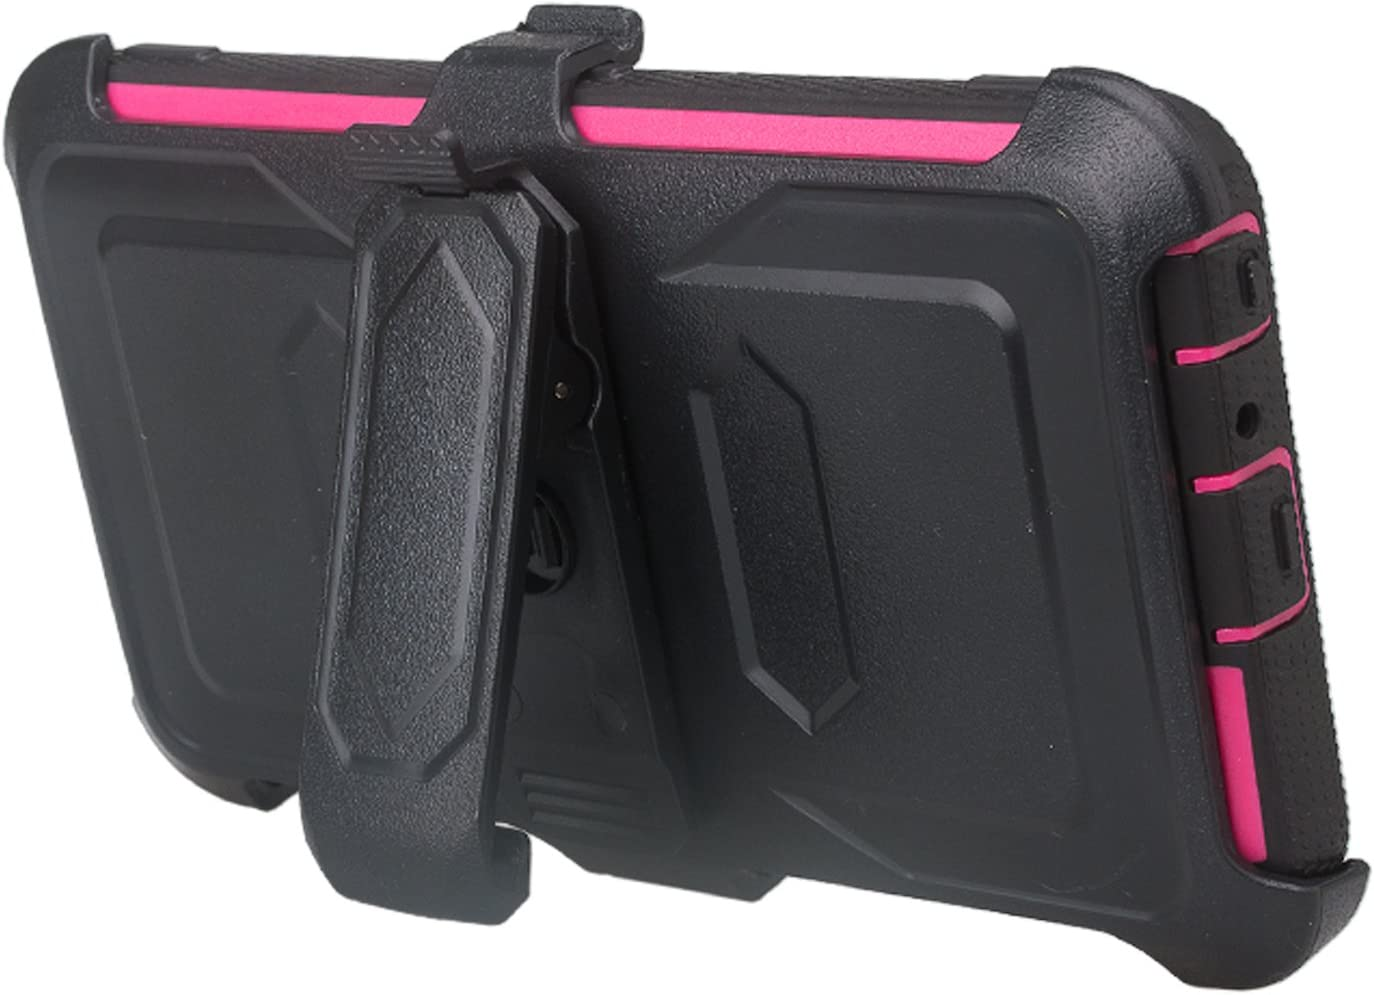 Full Body Case Hot Pink Belt Clip Holster Galaxy Wireless for ZTE ZFive G LTE Z557BL//ZTE ZFive C Z558VL//ZTE Avid 4//ZTE Fanfare 3//ZTE Blade Vantage//ZTE Tempo X//Tempo Go Built in Screen Protector